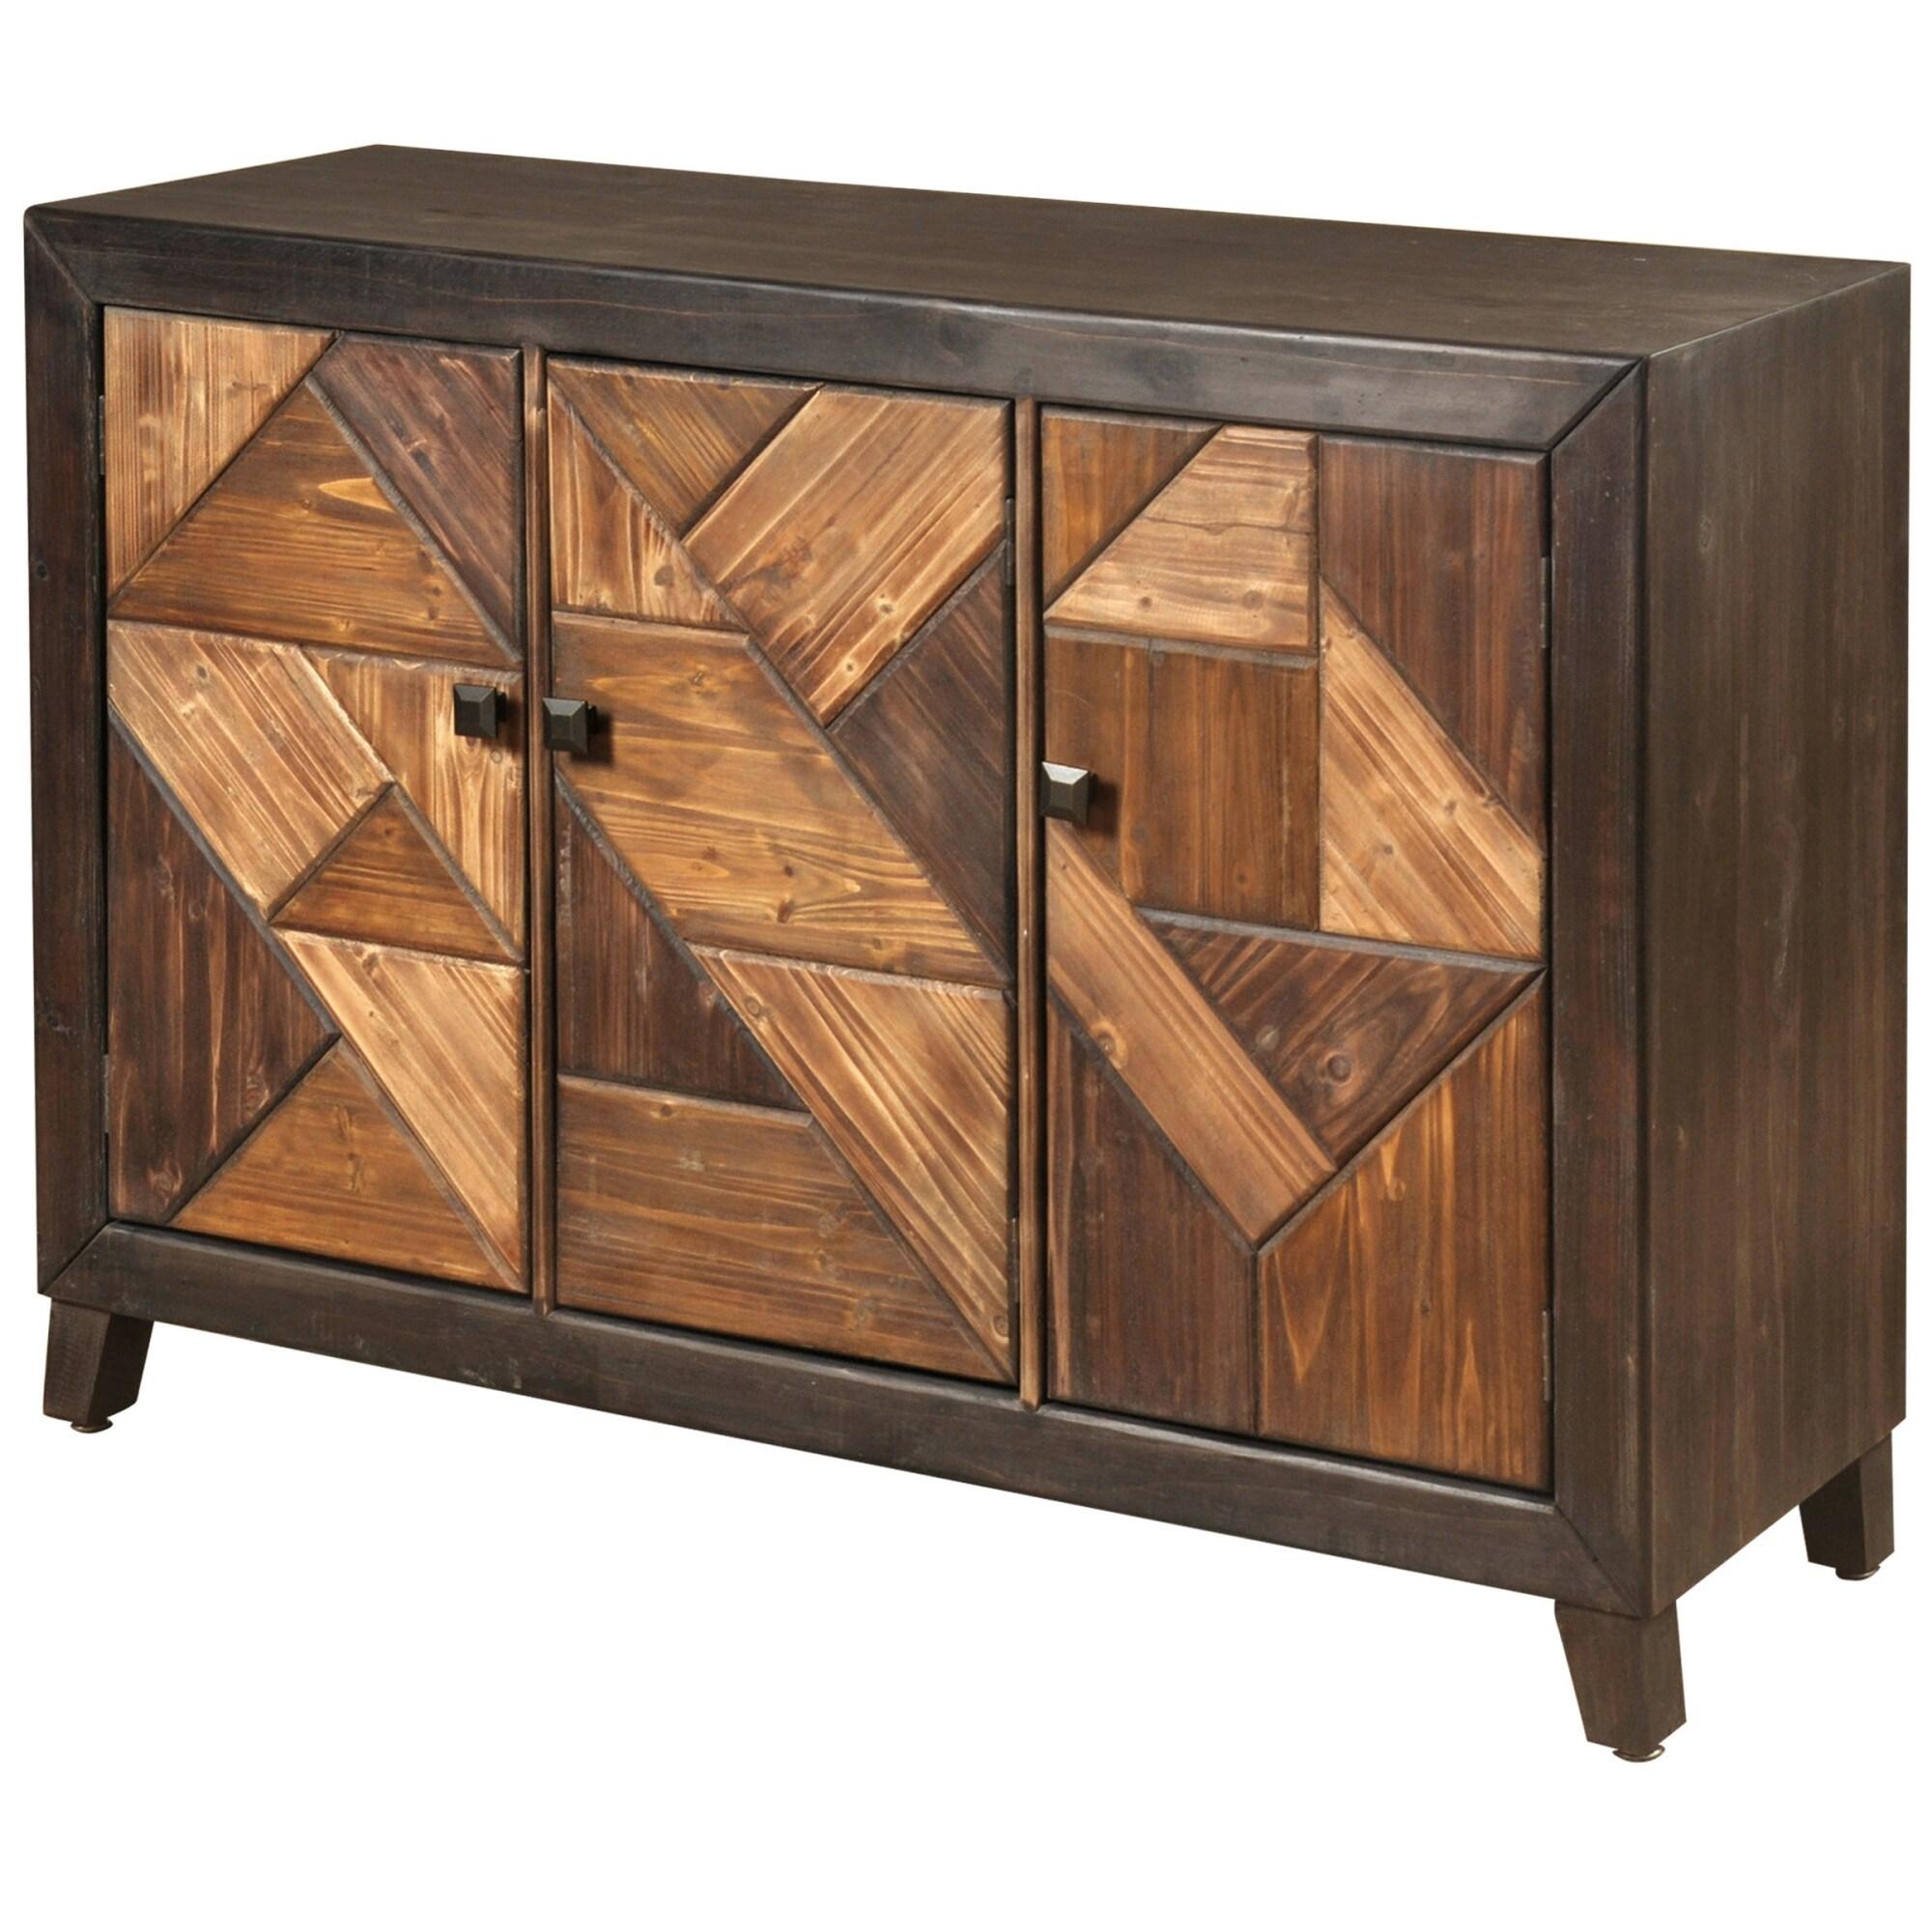 StyleCraft SC-SF24777  47 3/8 Wide Wood Credenza with Displaced Chevron Design - Espresso